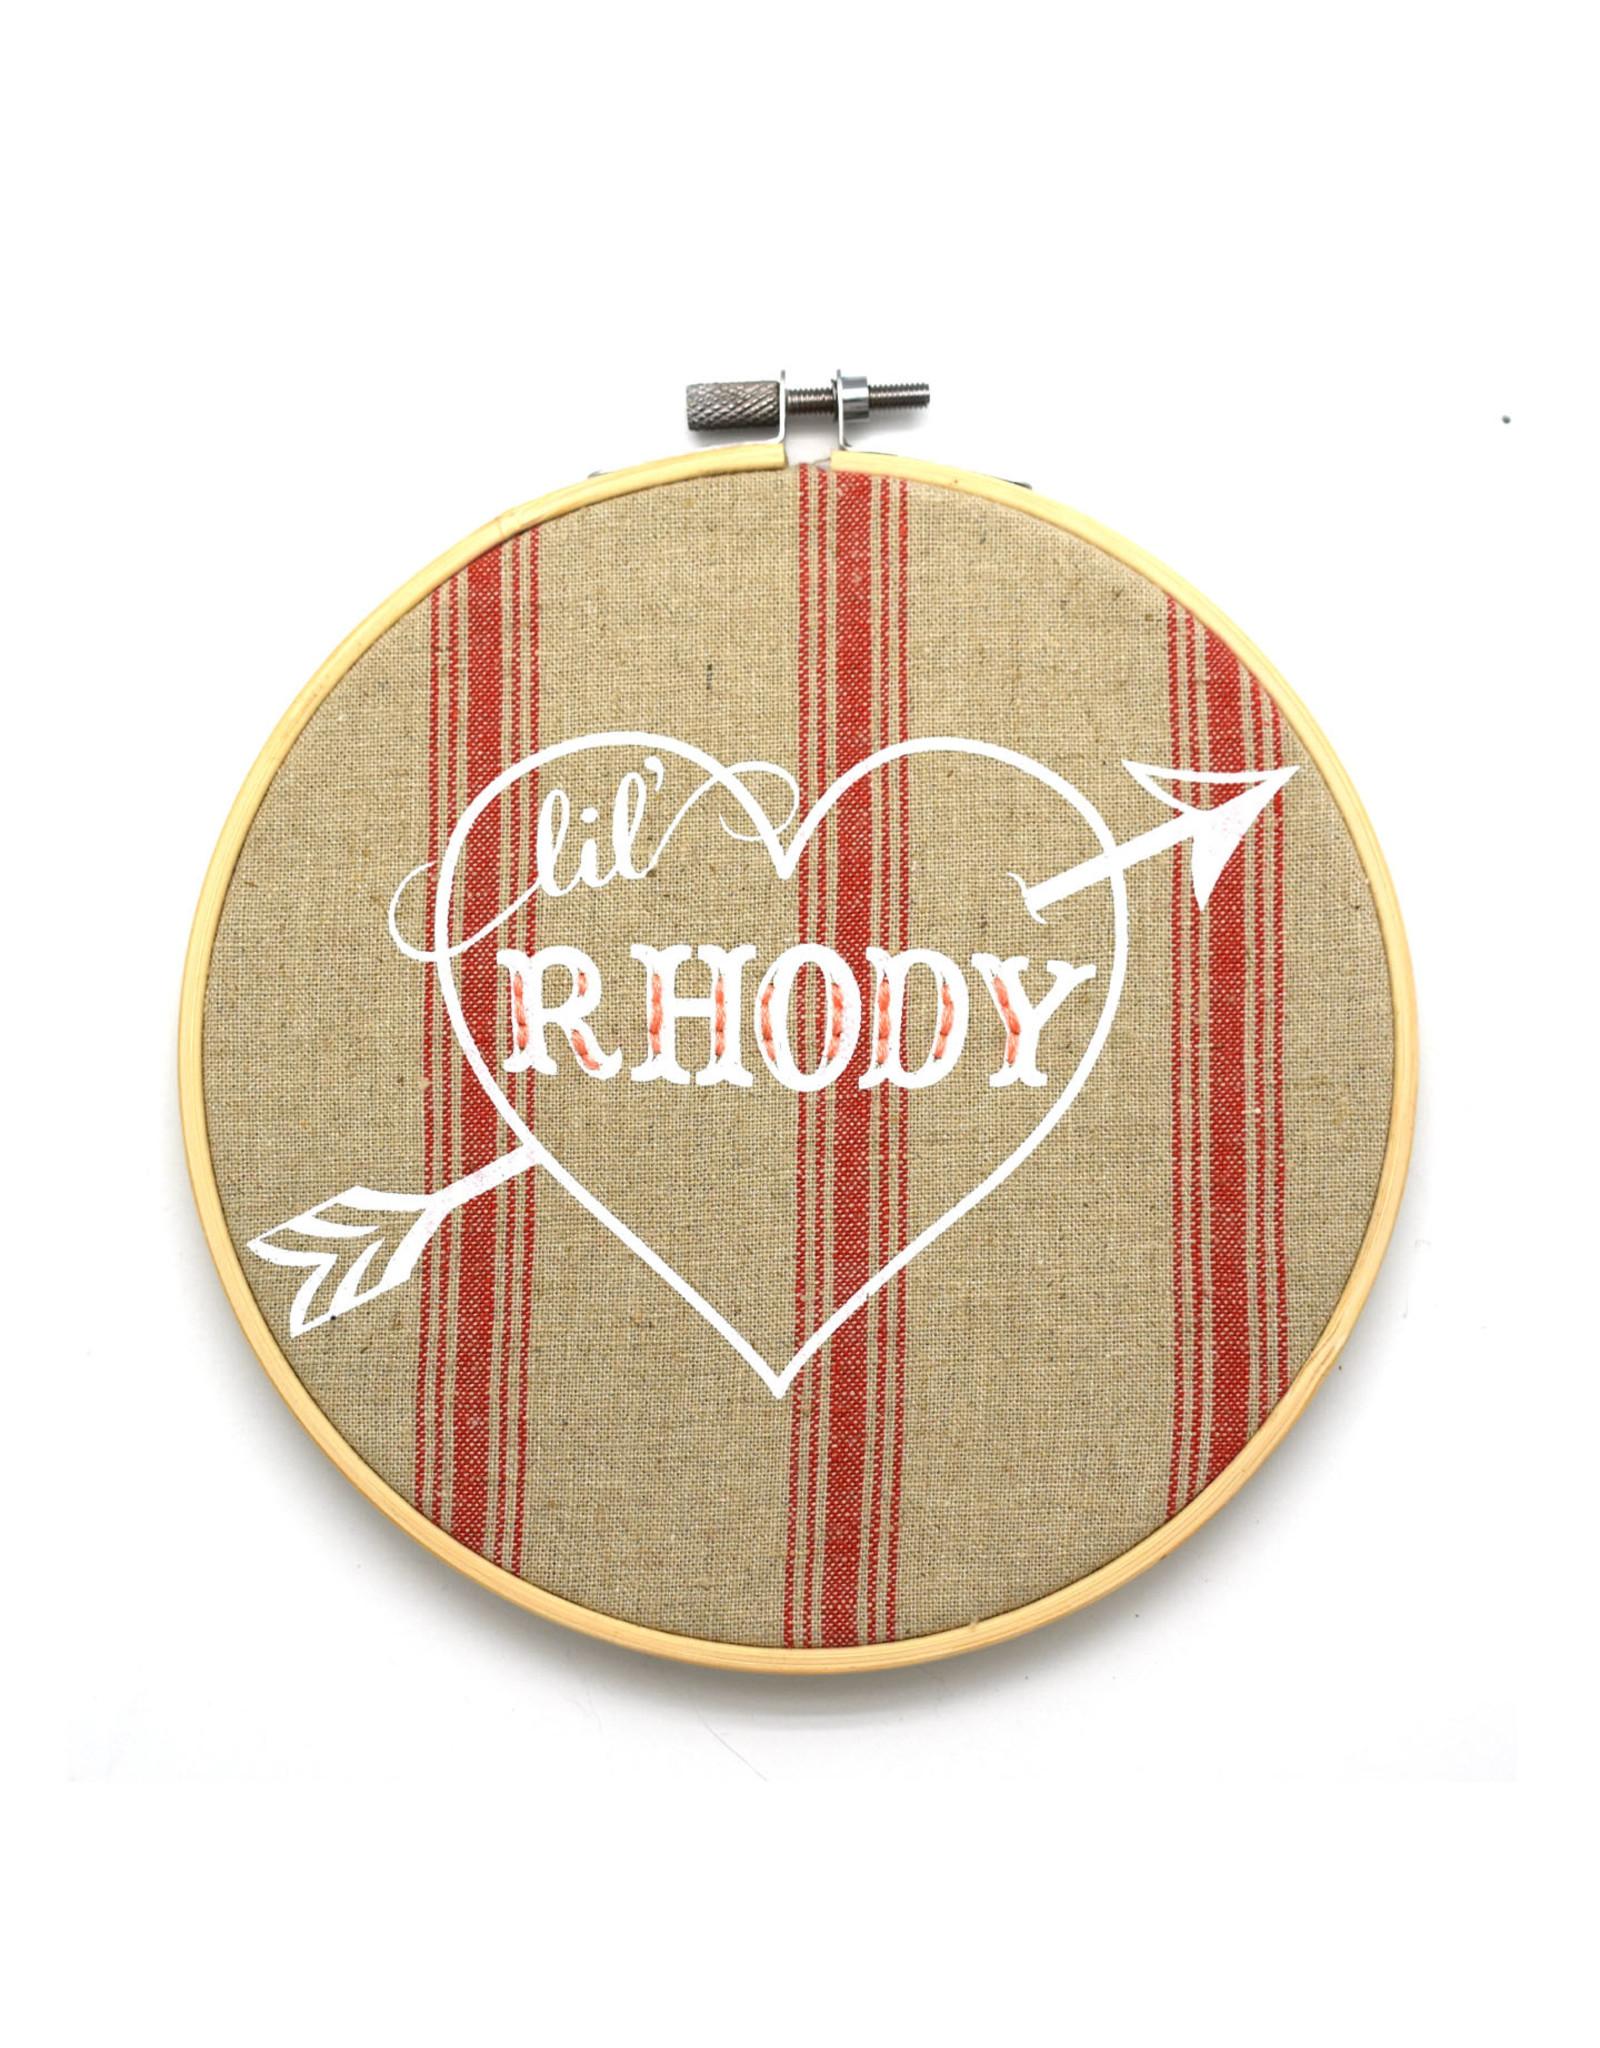 Lil' Rhody Heart Sampler Hoop (3 styles!)